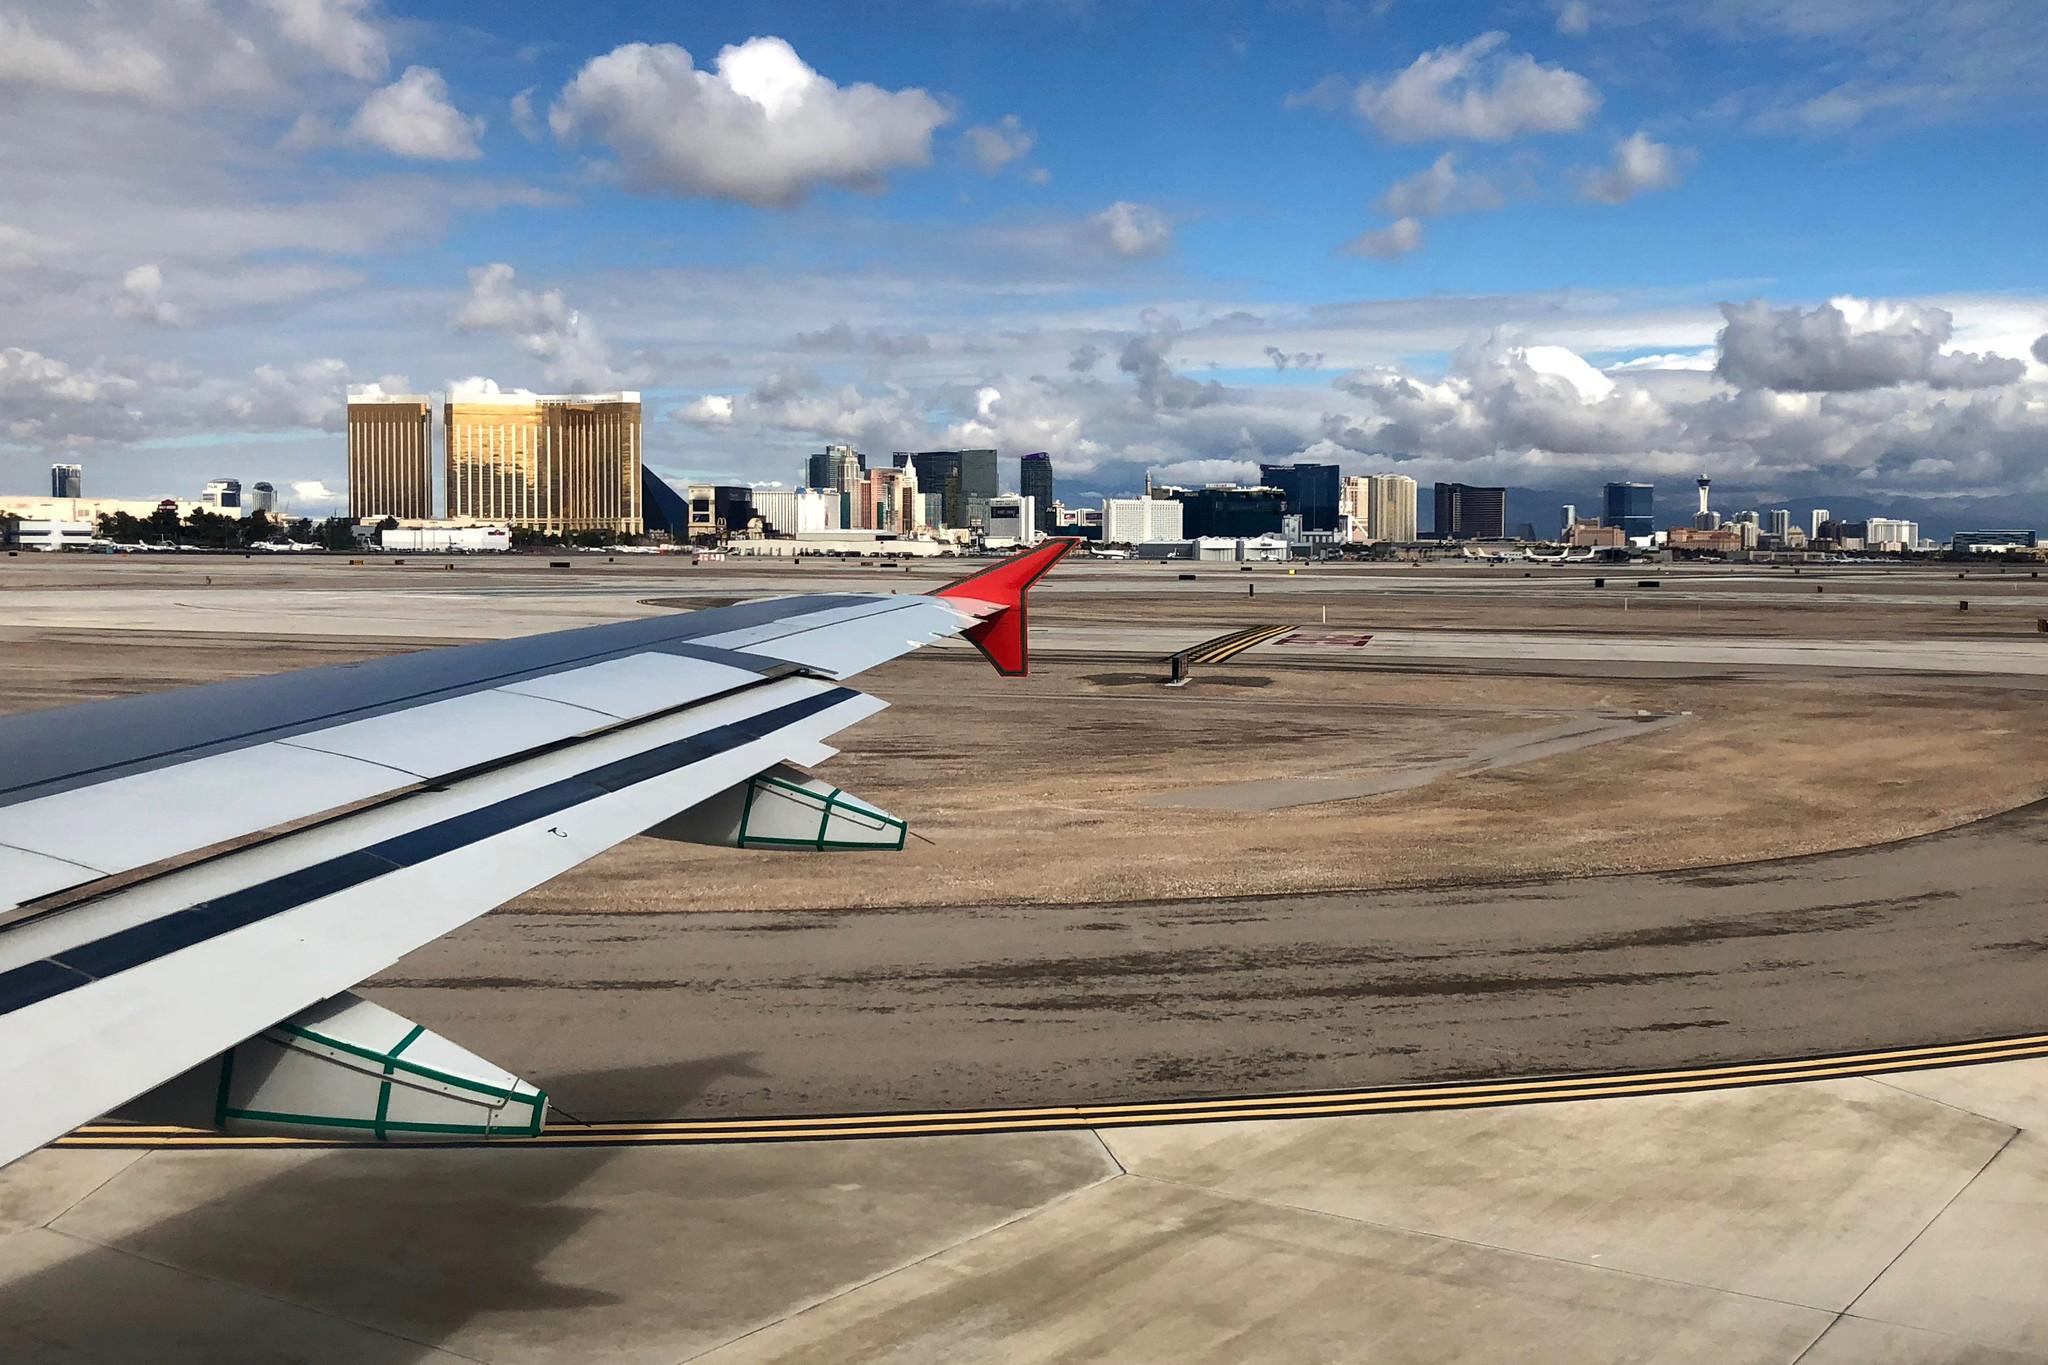 Las Vegas police shoot man accused of attacking them on tarmac at McCarran International Airport